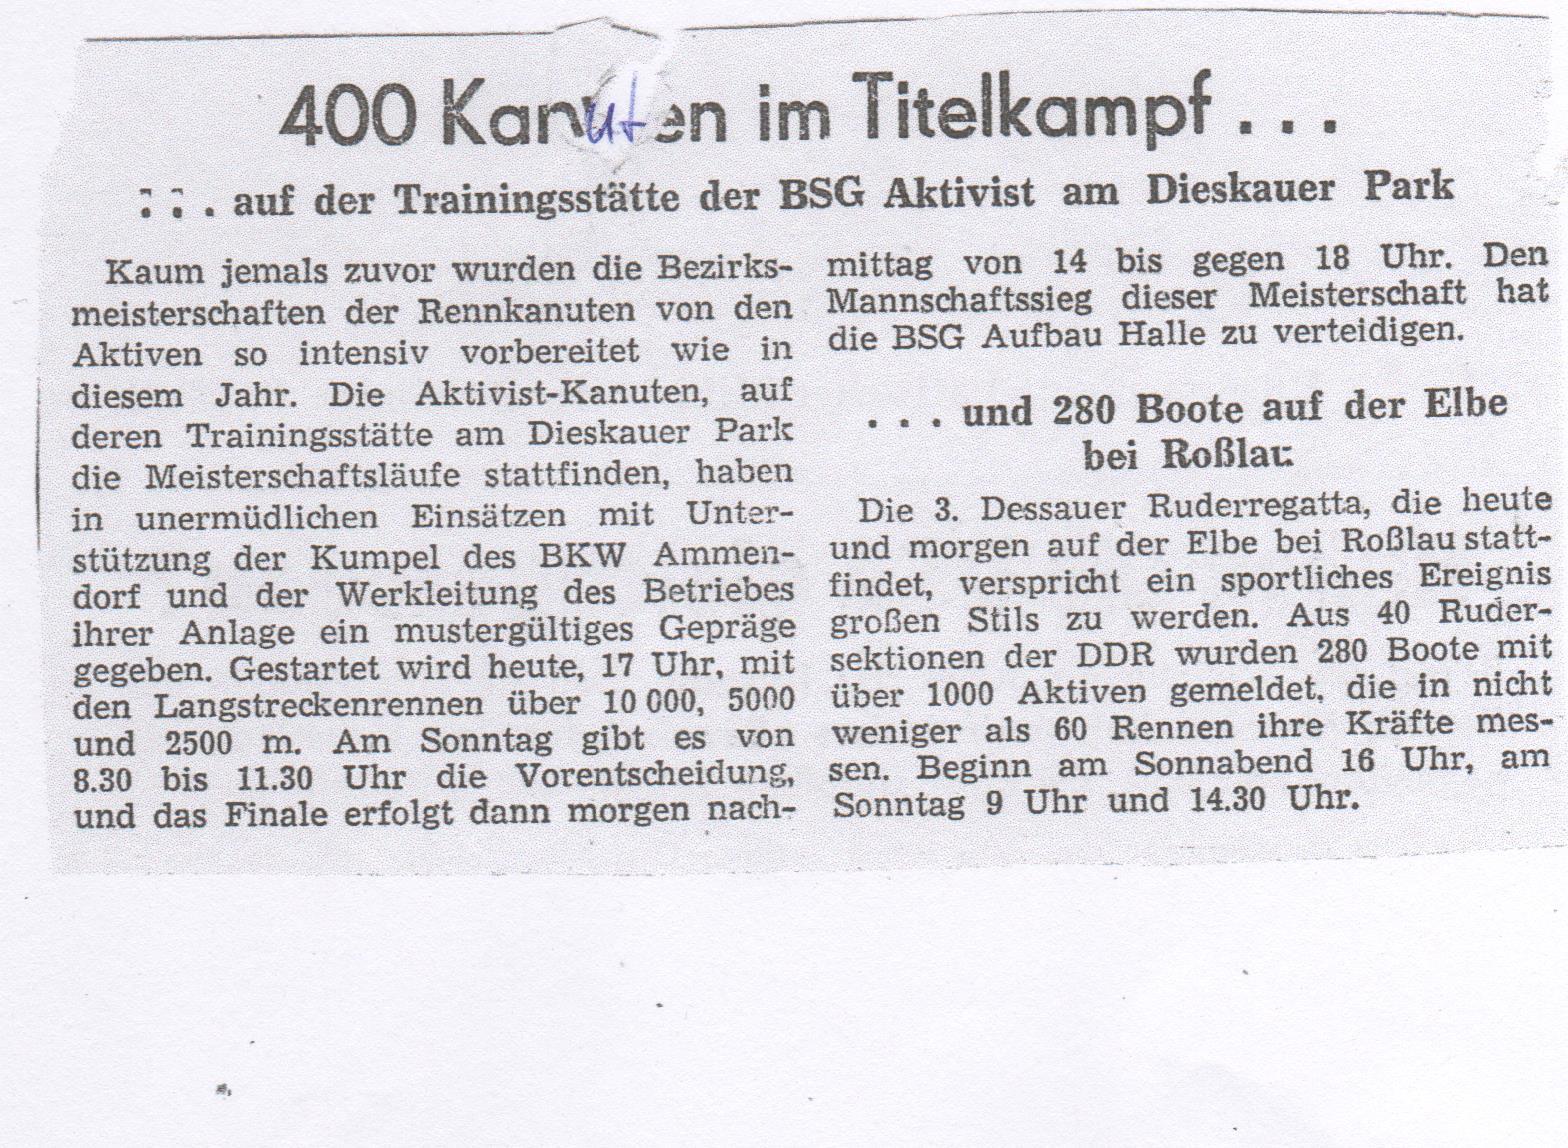 1963 400 Kanuten im Titelkampf